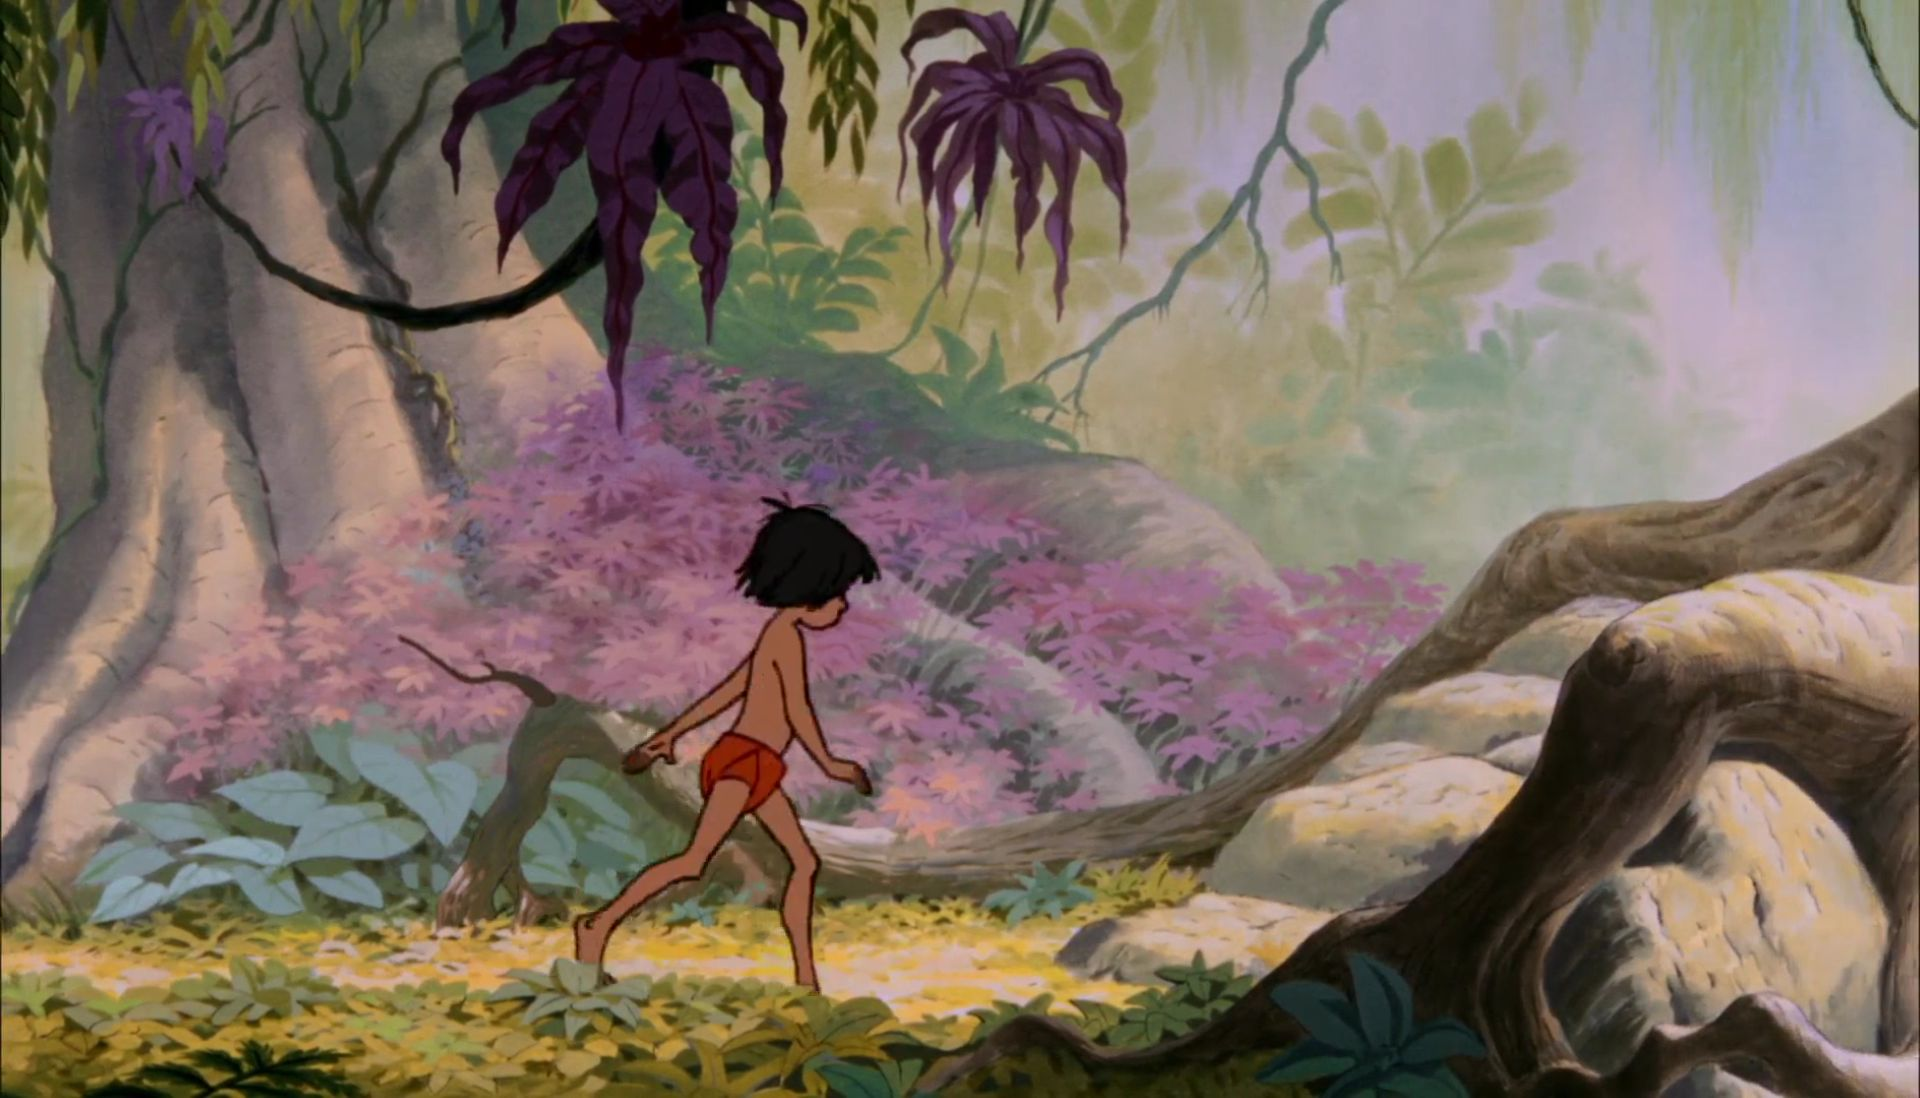 Jungle book movie animated